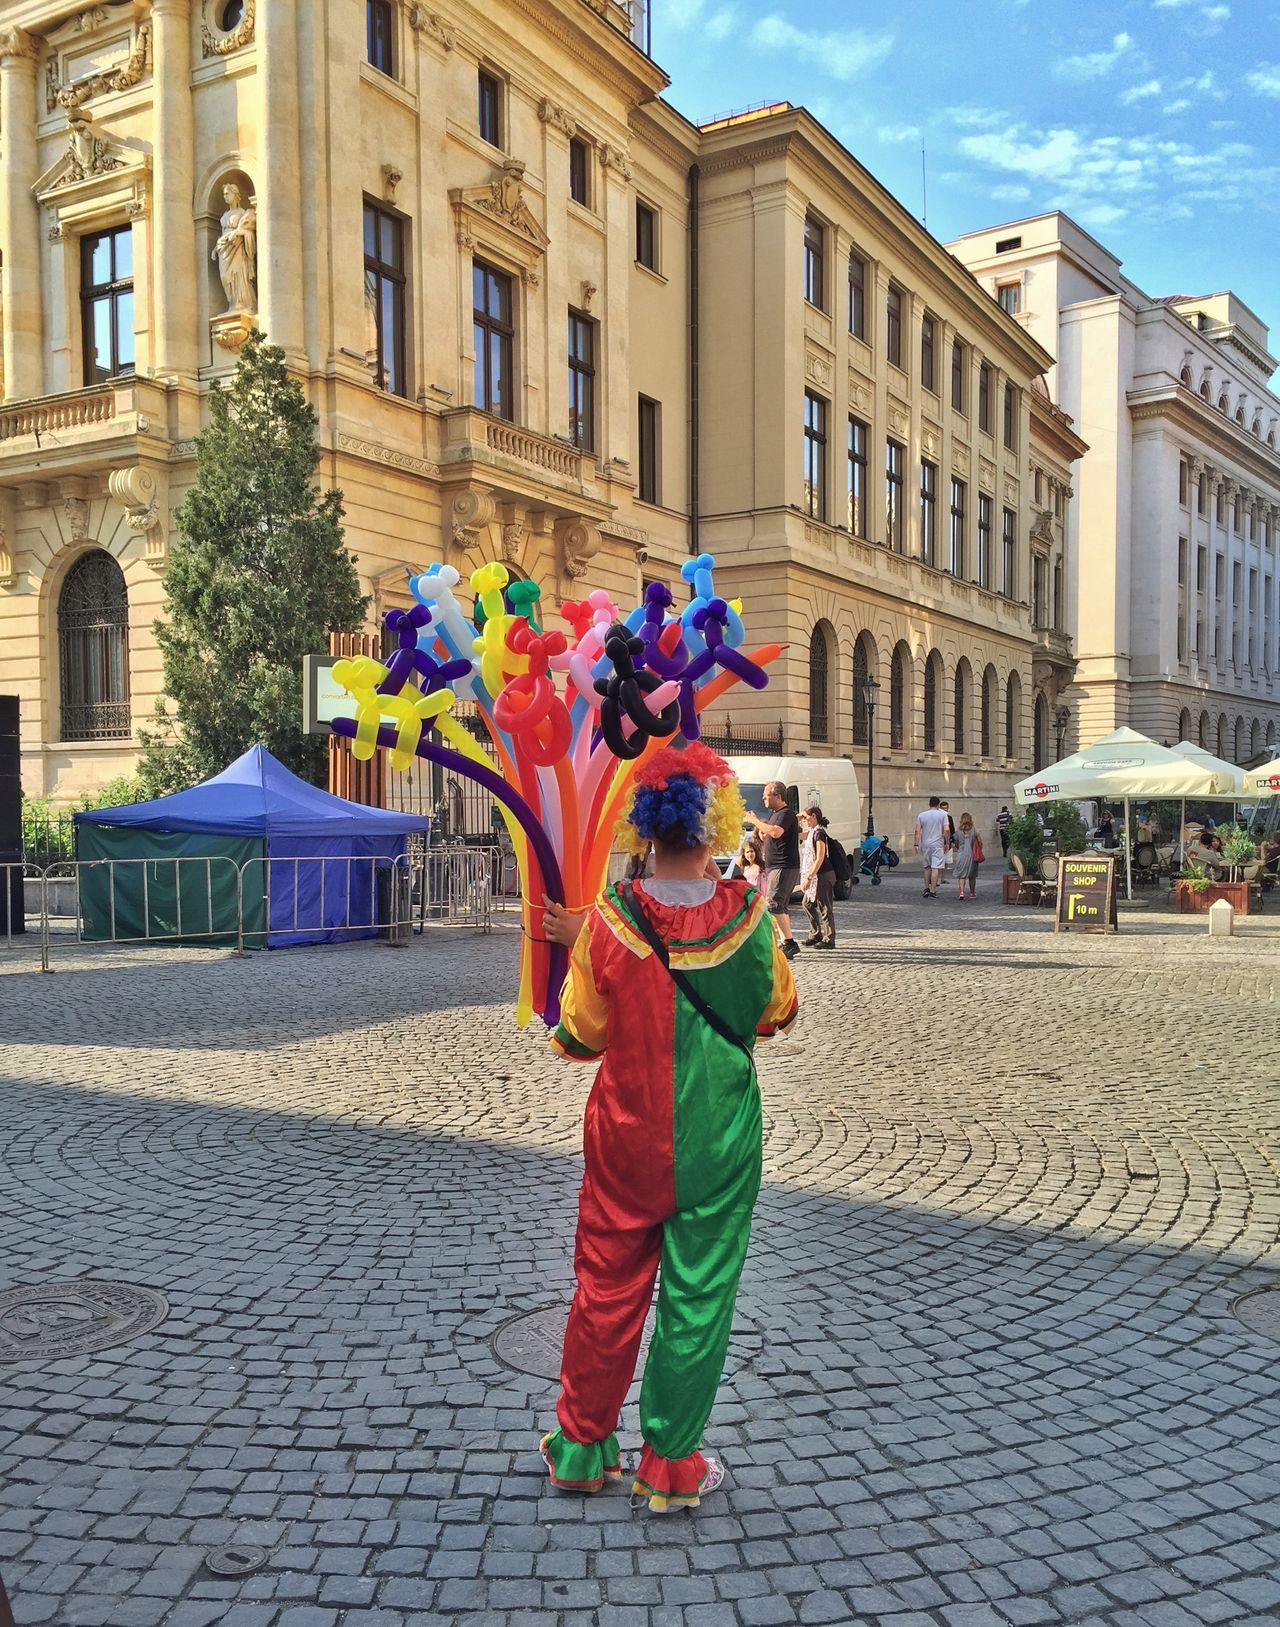 Beautiful stock photos of clown, Bucharest, Hostel, Romania, Vertical Image